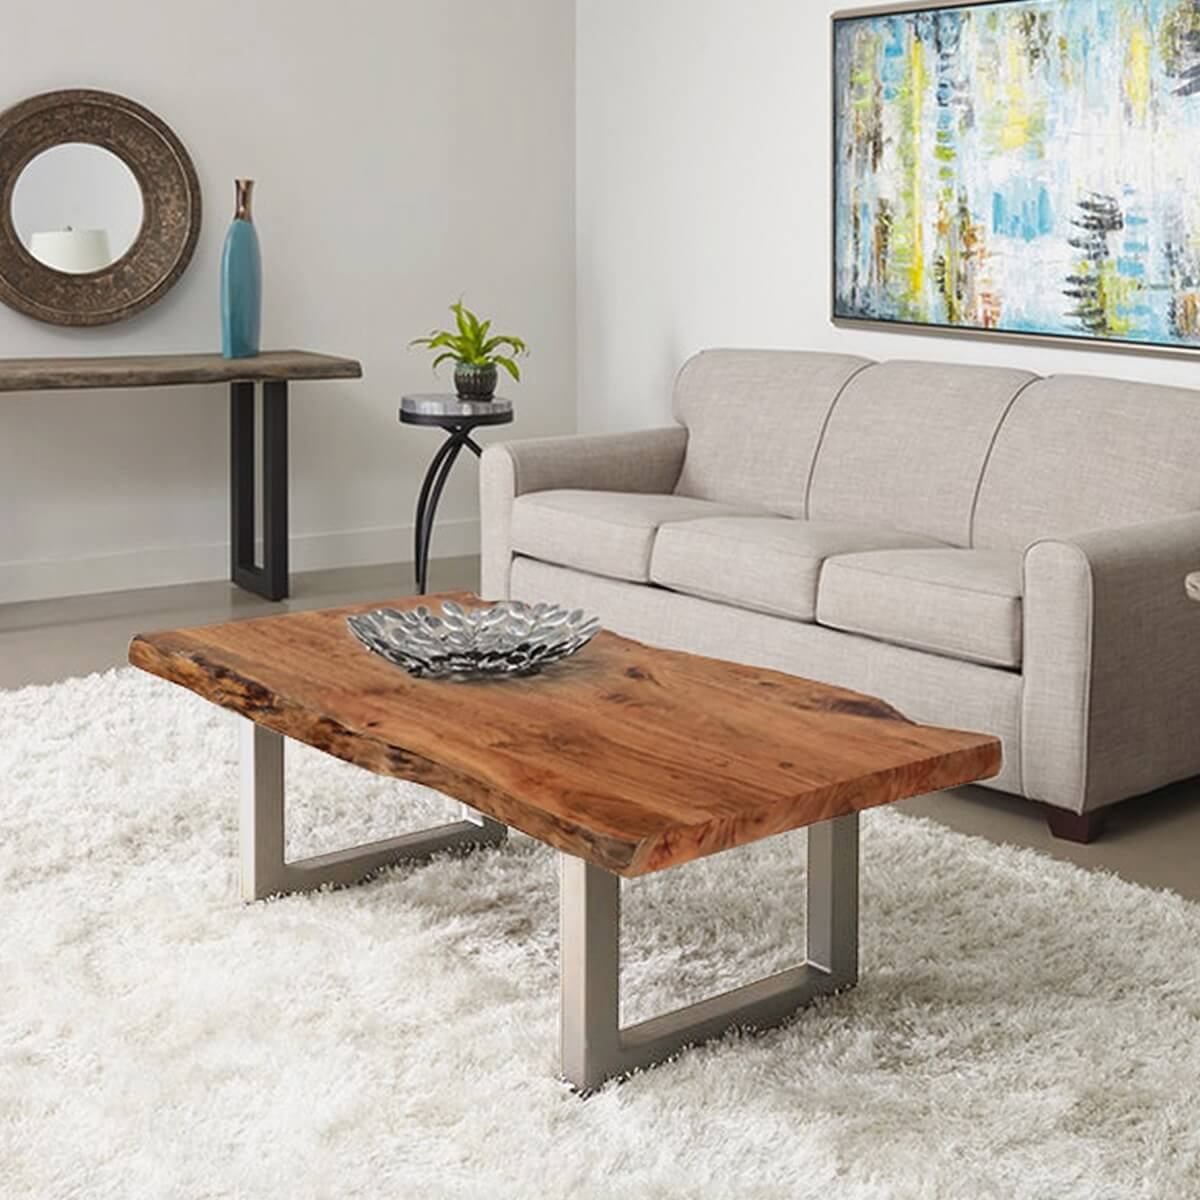 Natural Acacia Wood Steel Rustic Live Edge Coffee Table